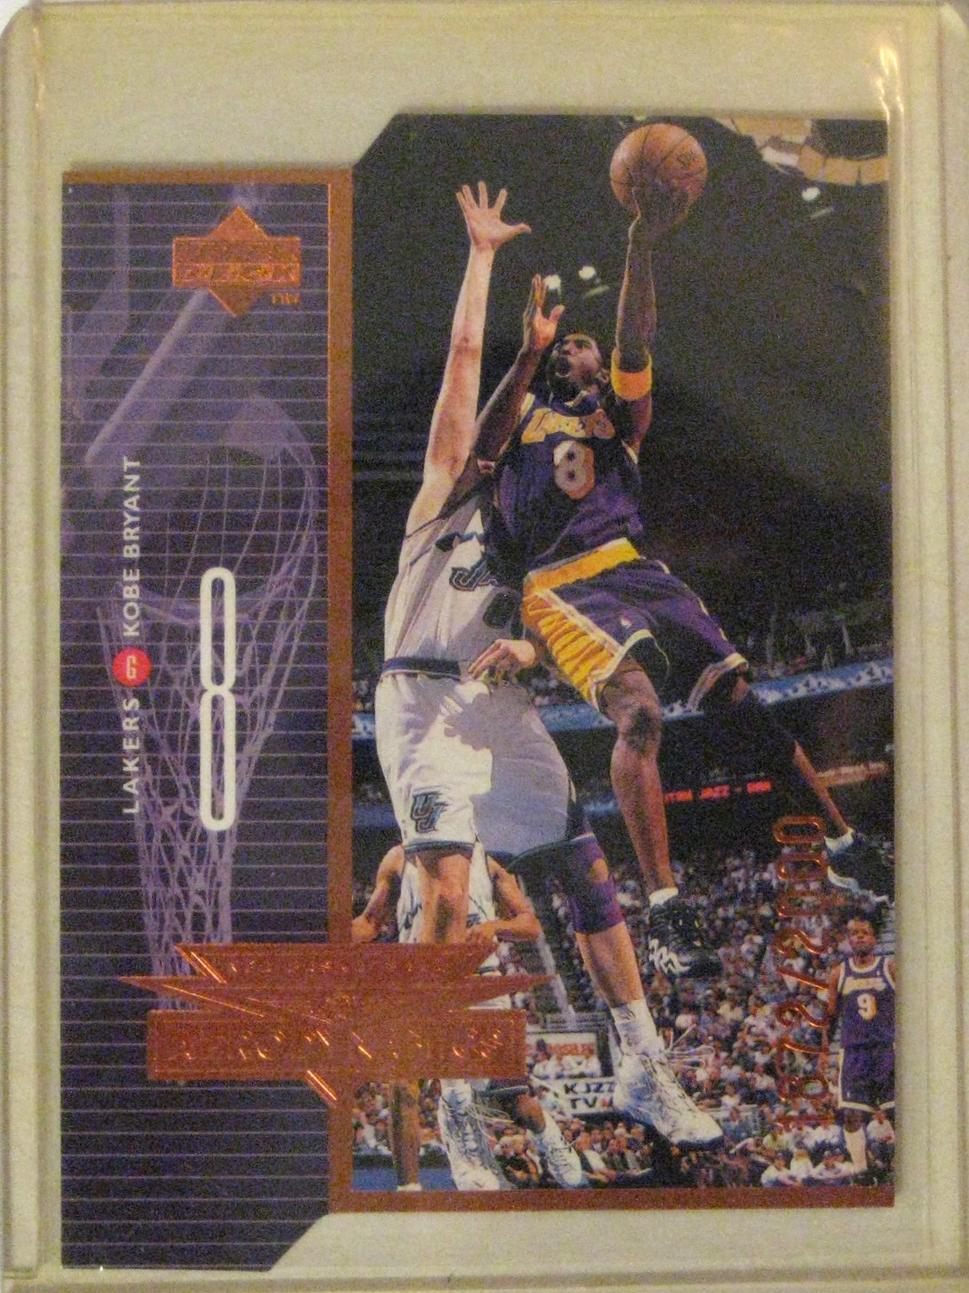 1998-99 Upper Deck Aerodynamics Kobe Bryant Bronze #/2000